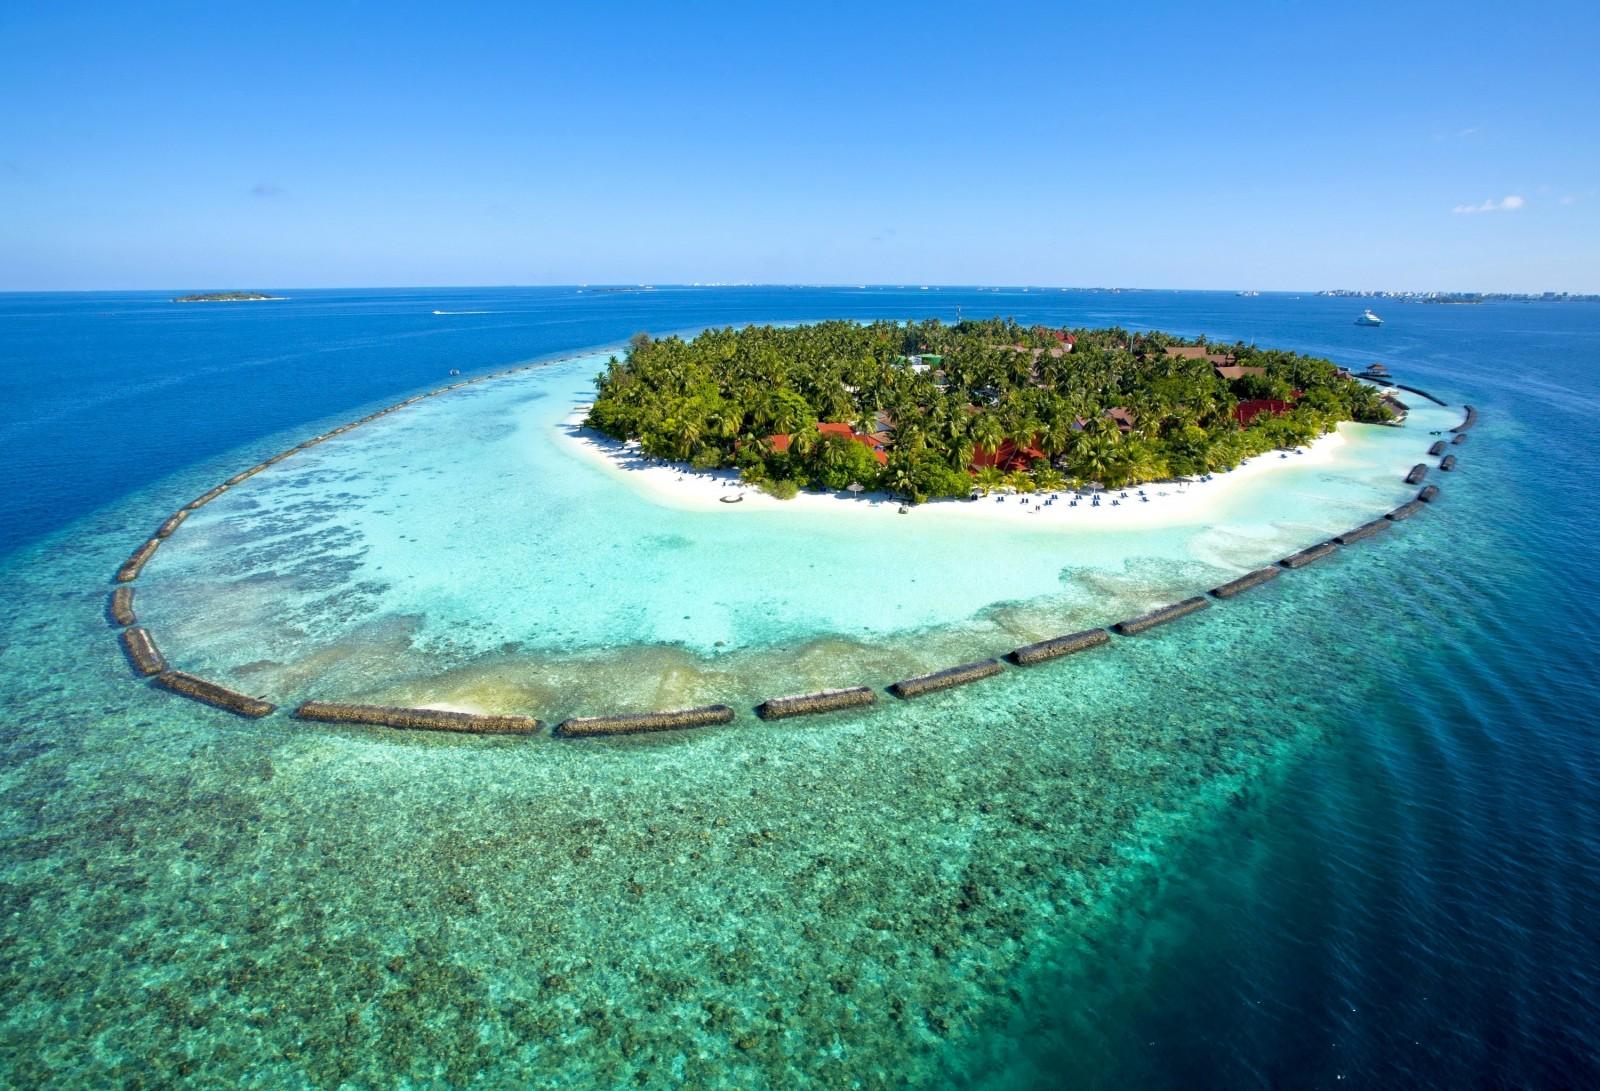 3000x2046_px_beach_landscape_Maldives-683604